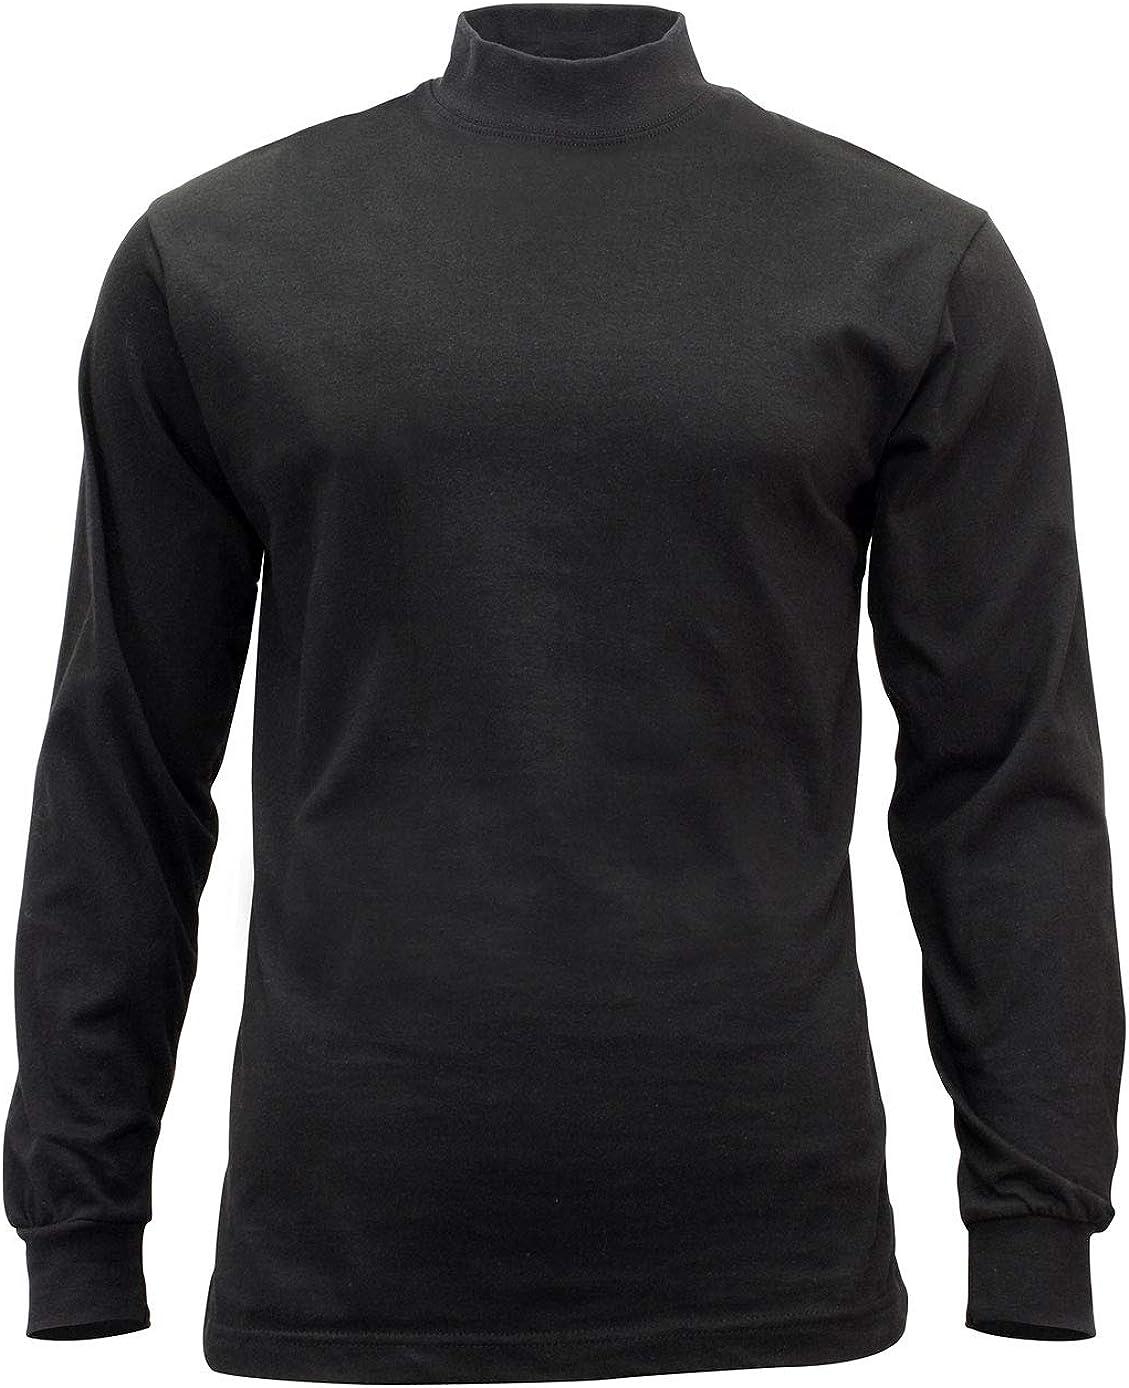 Rothco Mock Turtleneck: Clothing